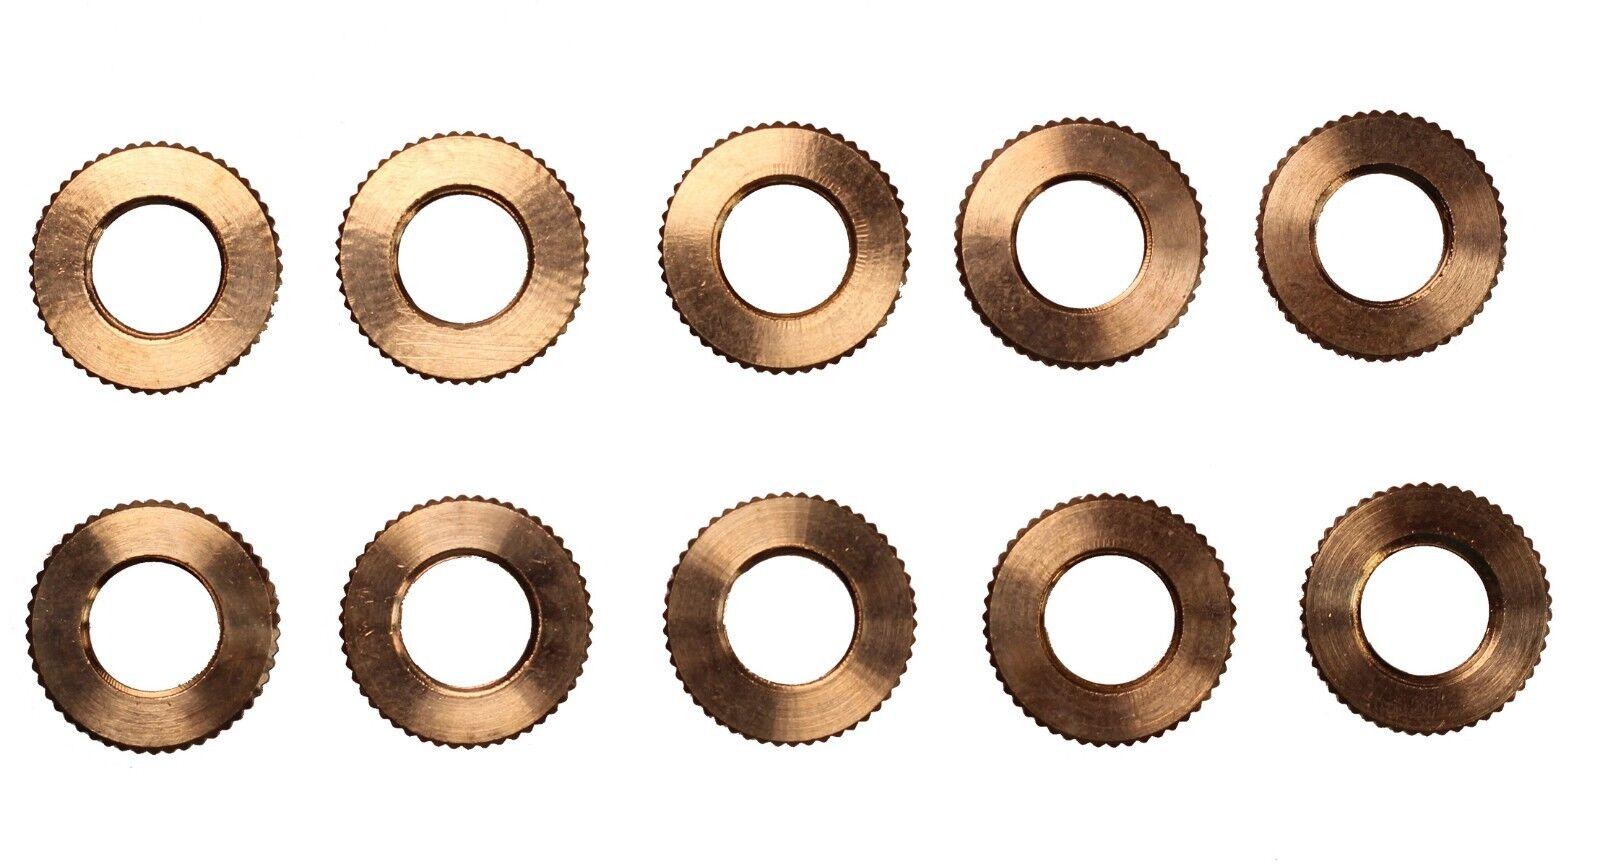 Brass Knurled Locknut, Fits 1/8IP Standard Lamp Pipe, DIY Repair – 10 Pcs Collectibles